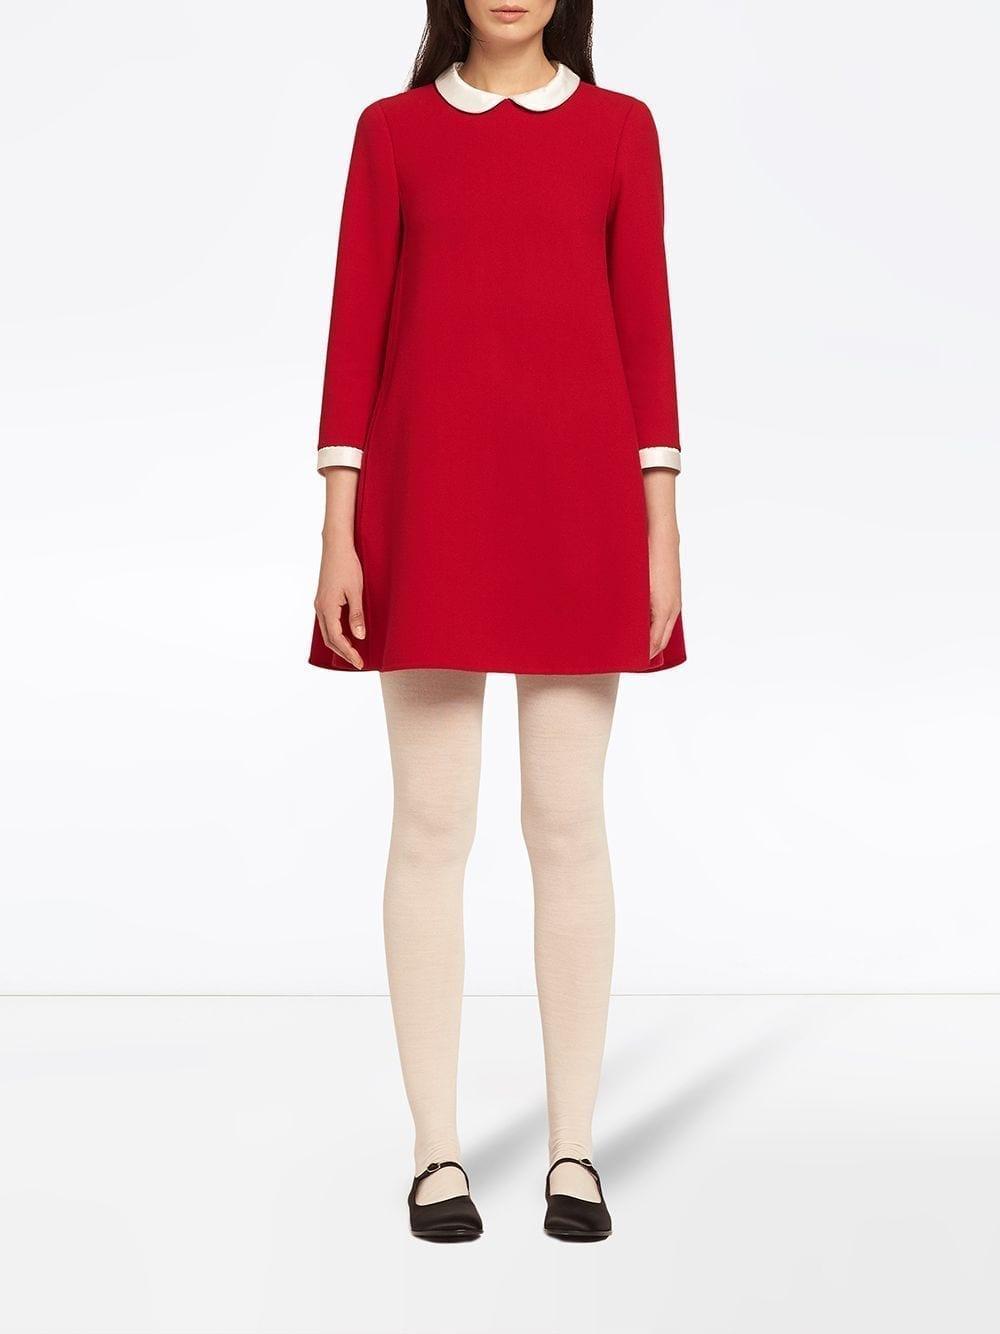 MARC JACOBS Shift Style Mini Dress